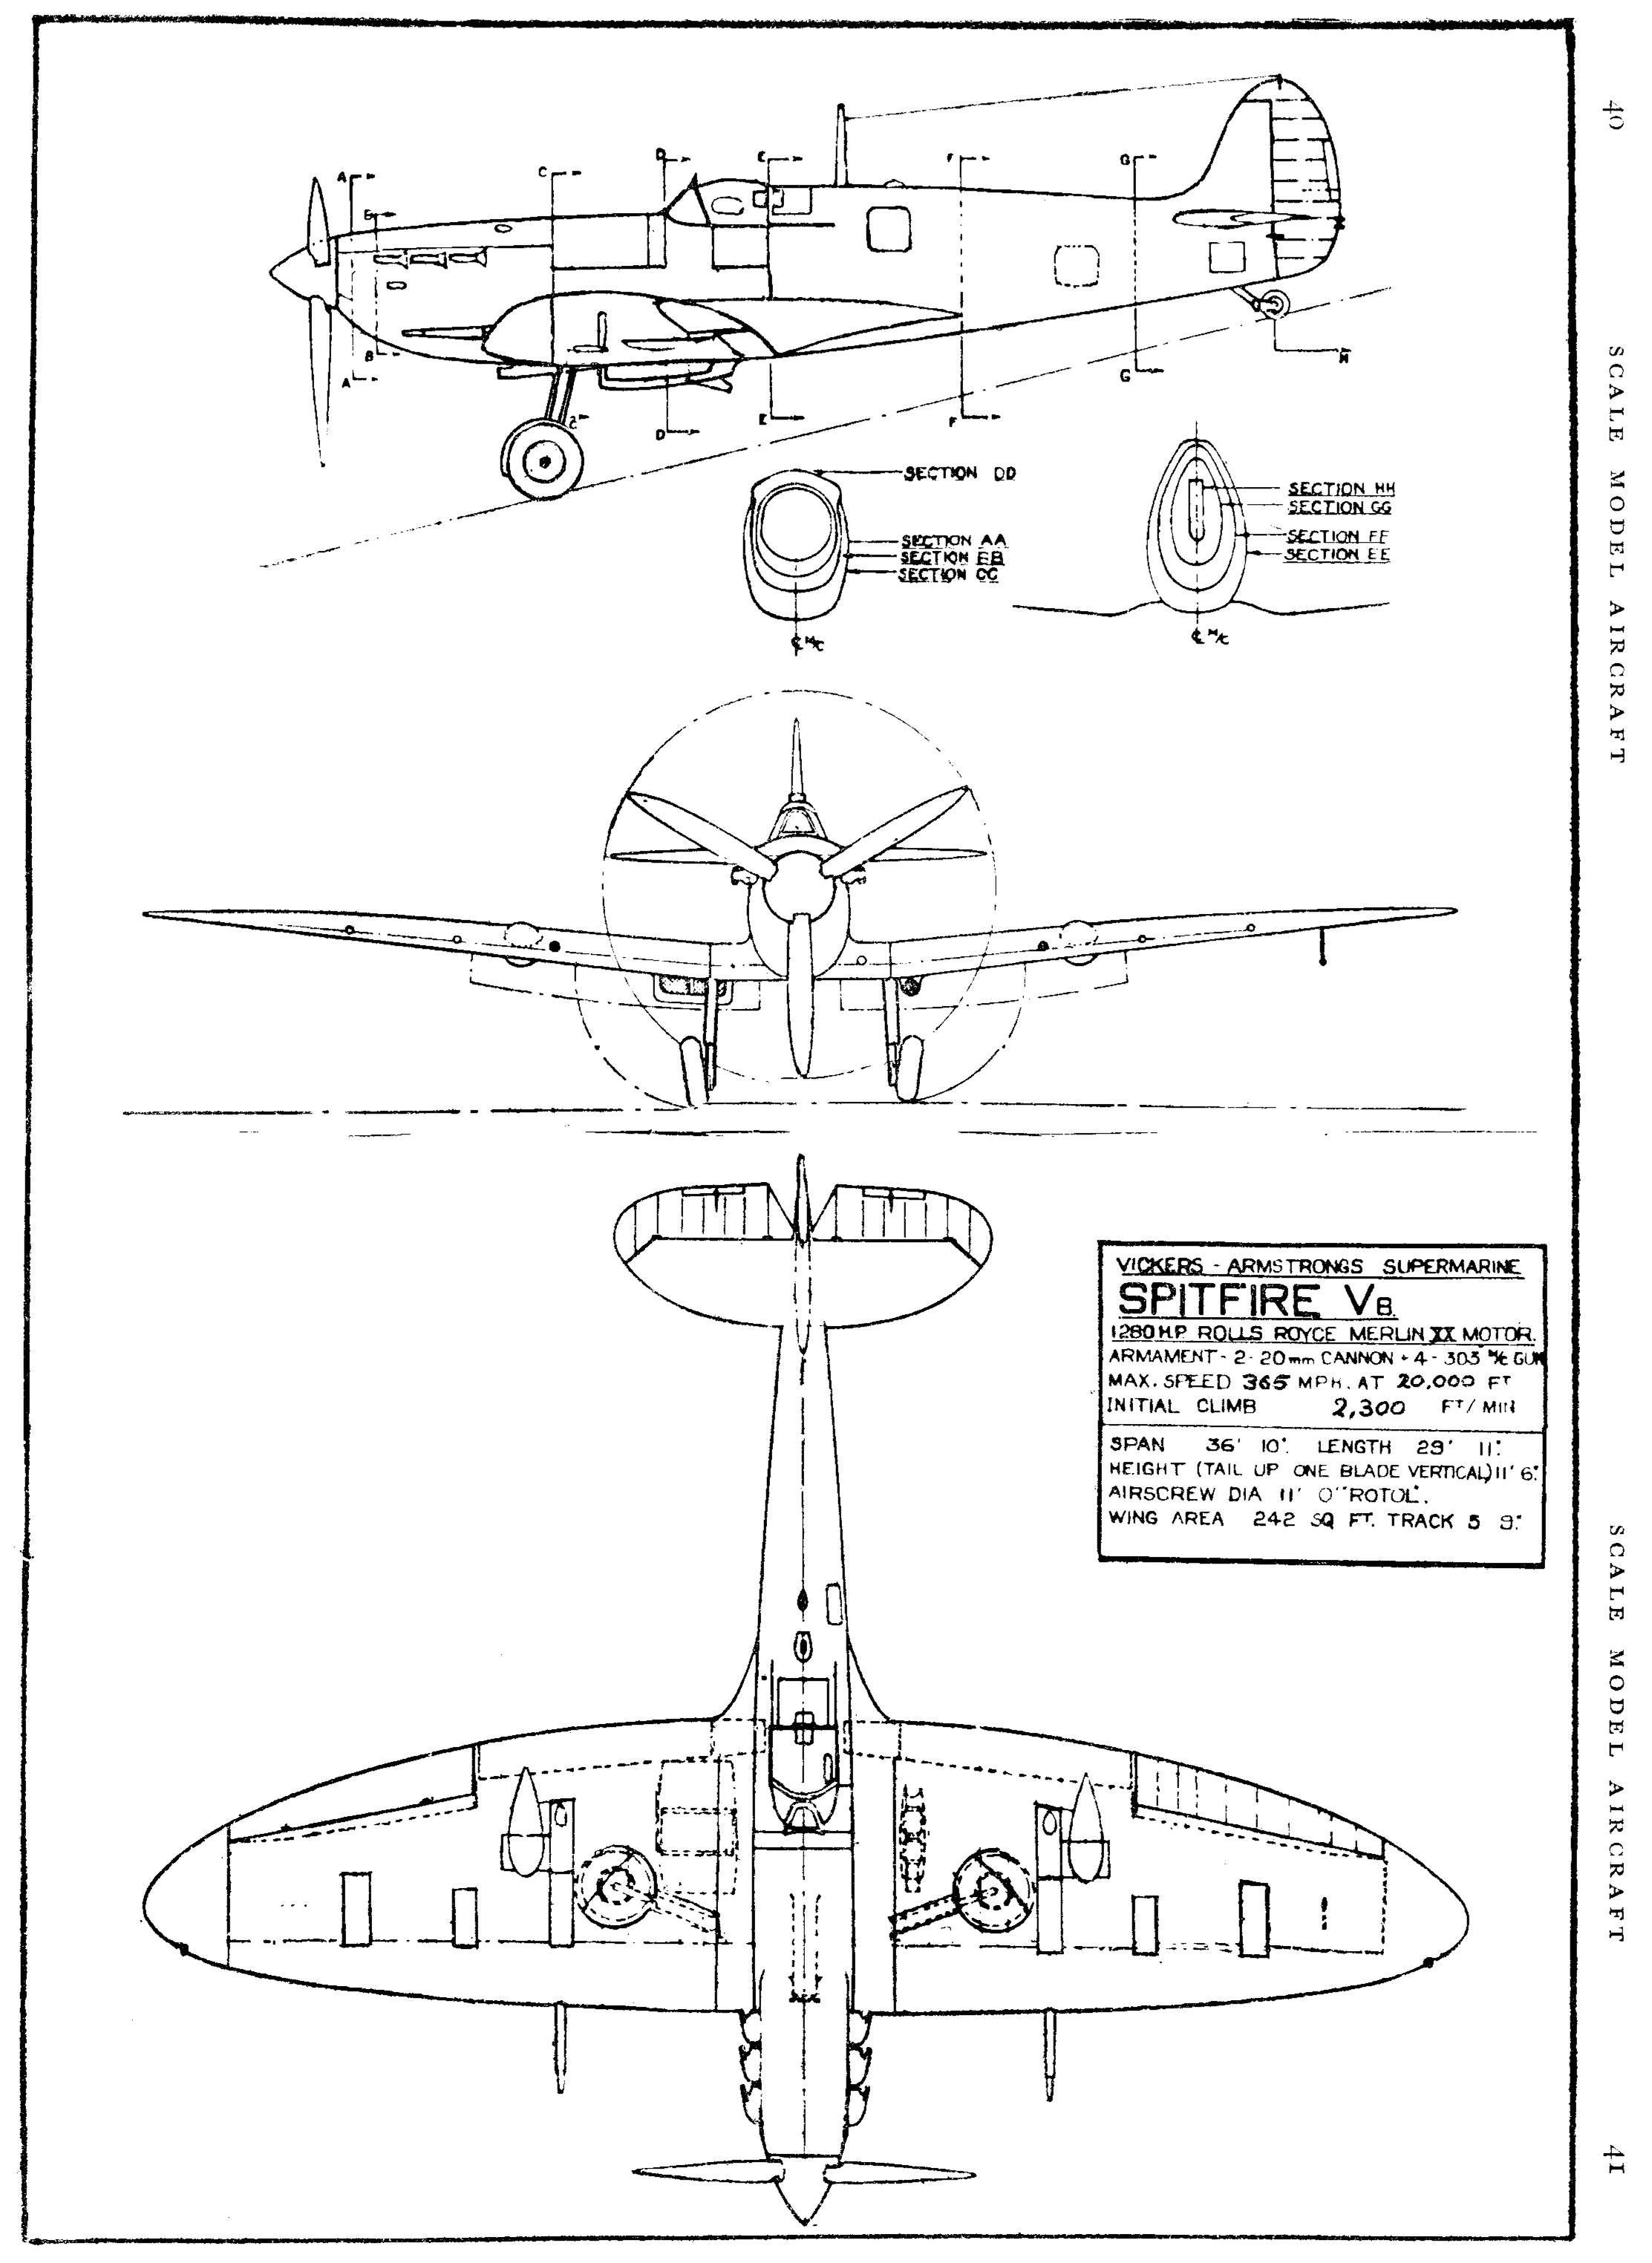 Cessna 406 Diagram 2000 Hayabusa Wiring Bush Plane 11 Stromoeko De Spitfire Vb Projects To Try Aircraft Design Rh Pinterest Com